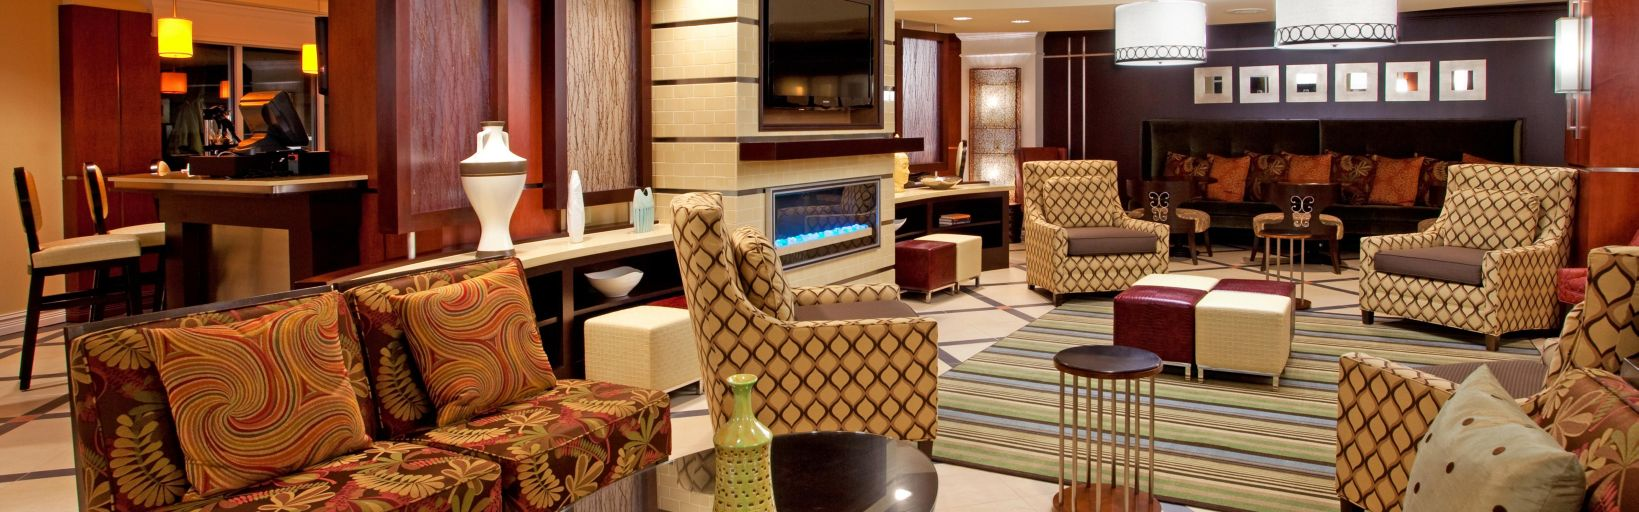 Holiday Inn Anderson Hotel by IHG